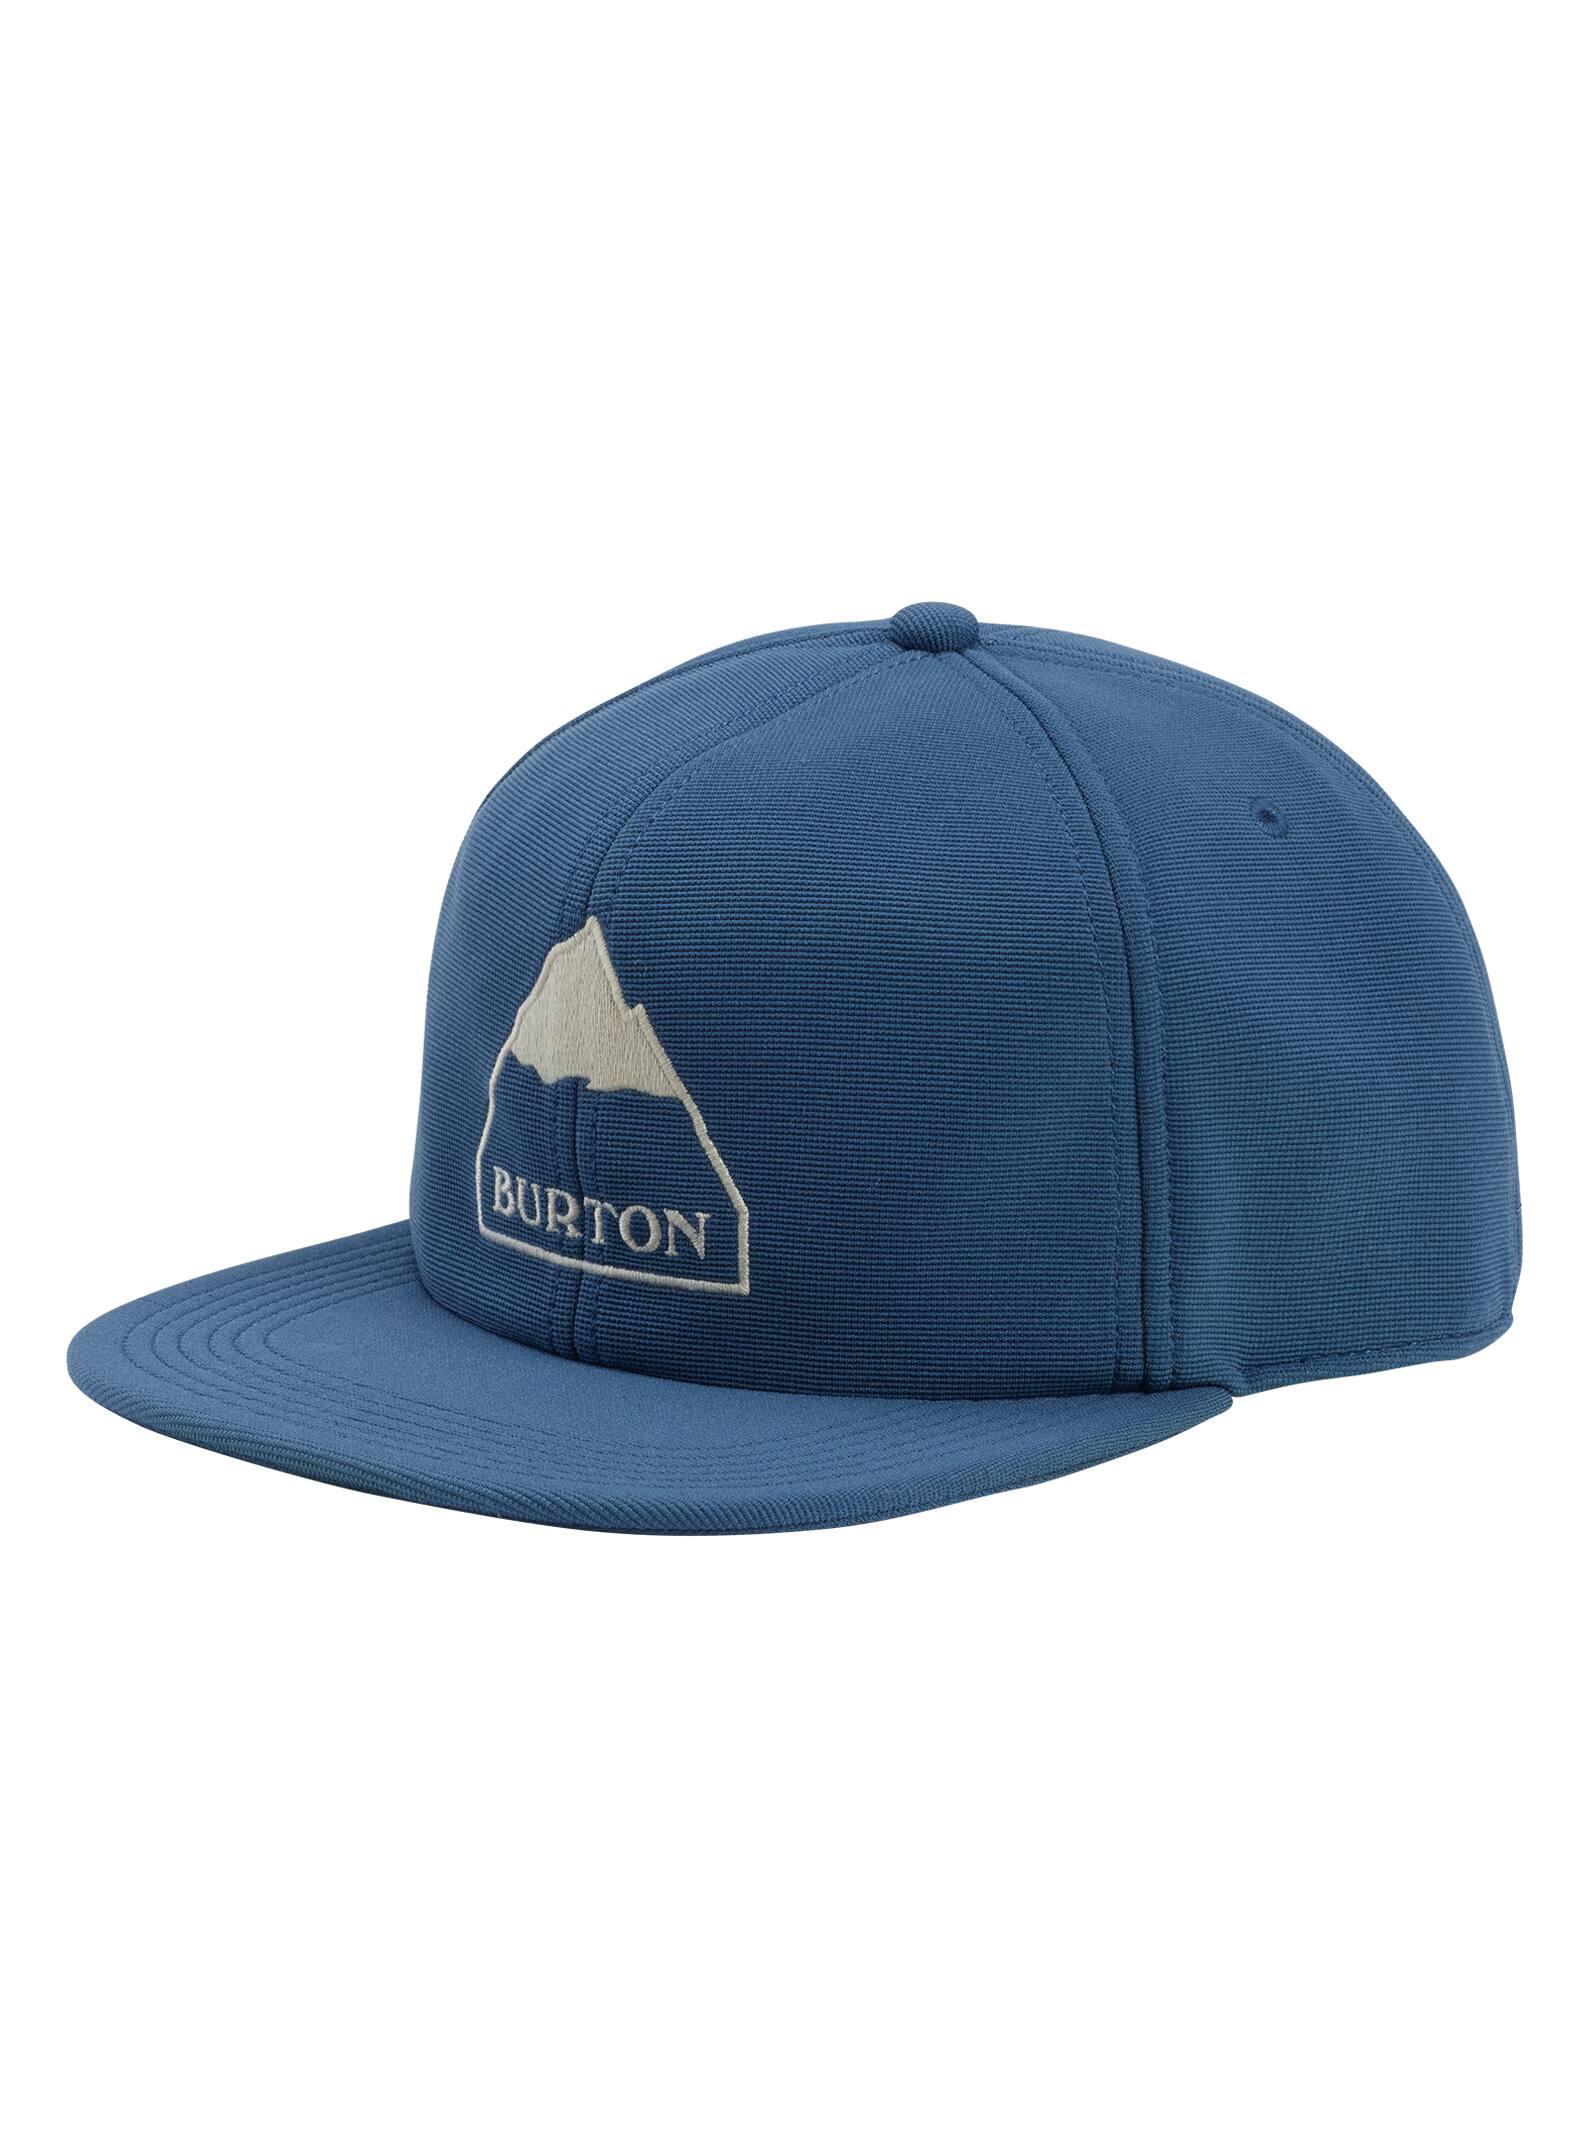 121276ade Men's Hats & Beanies | Burton Snowboards